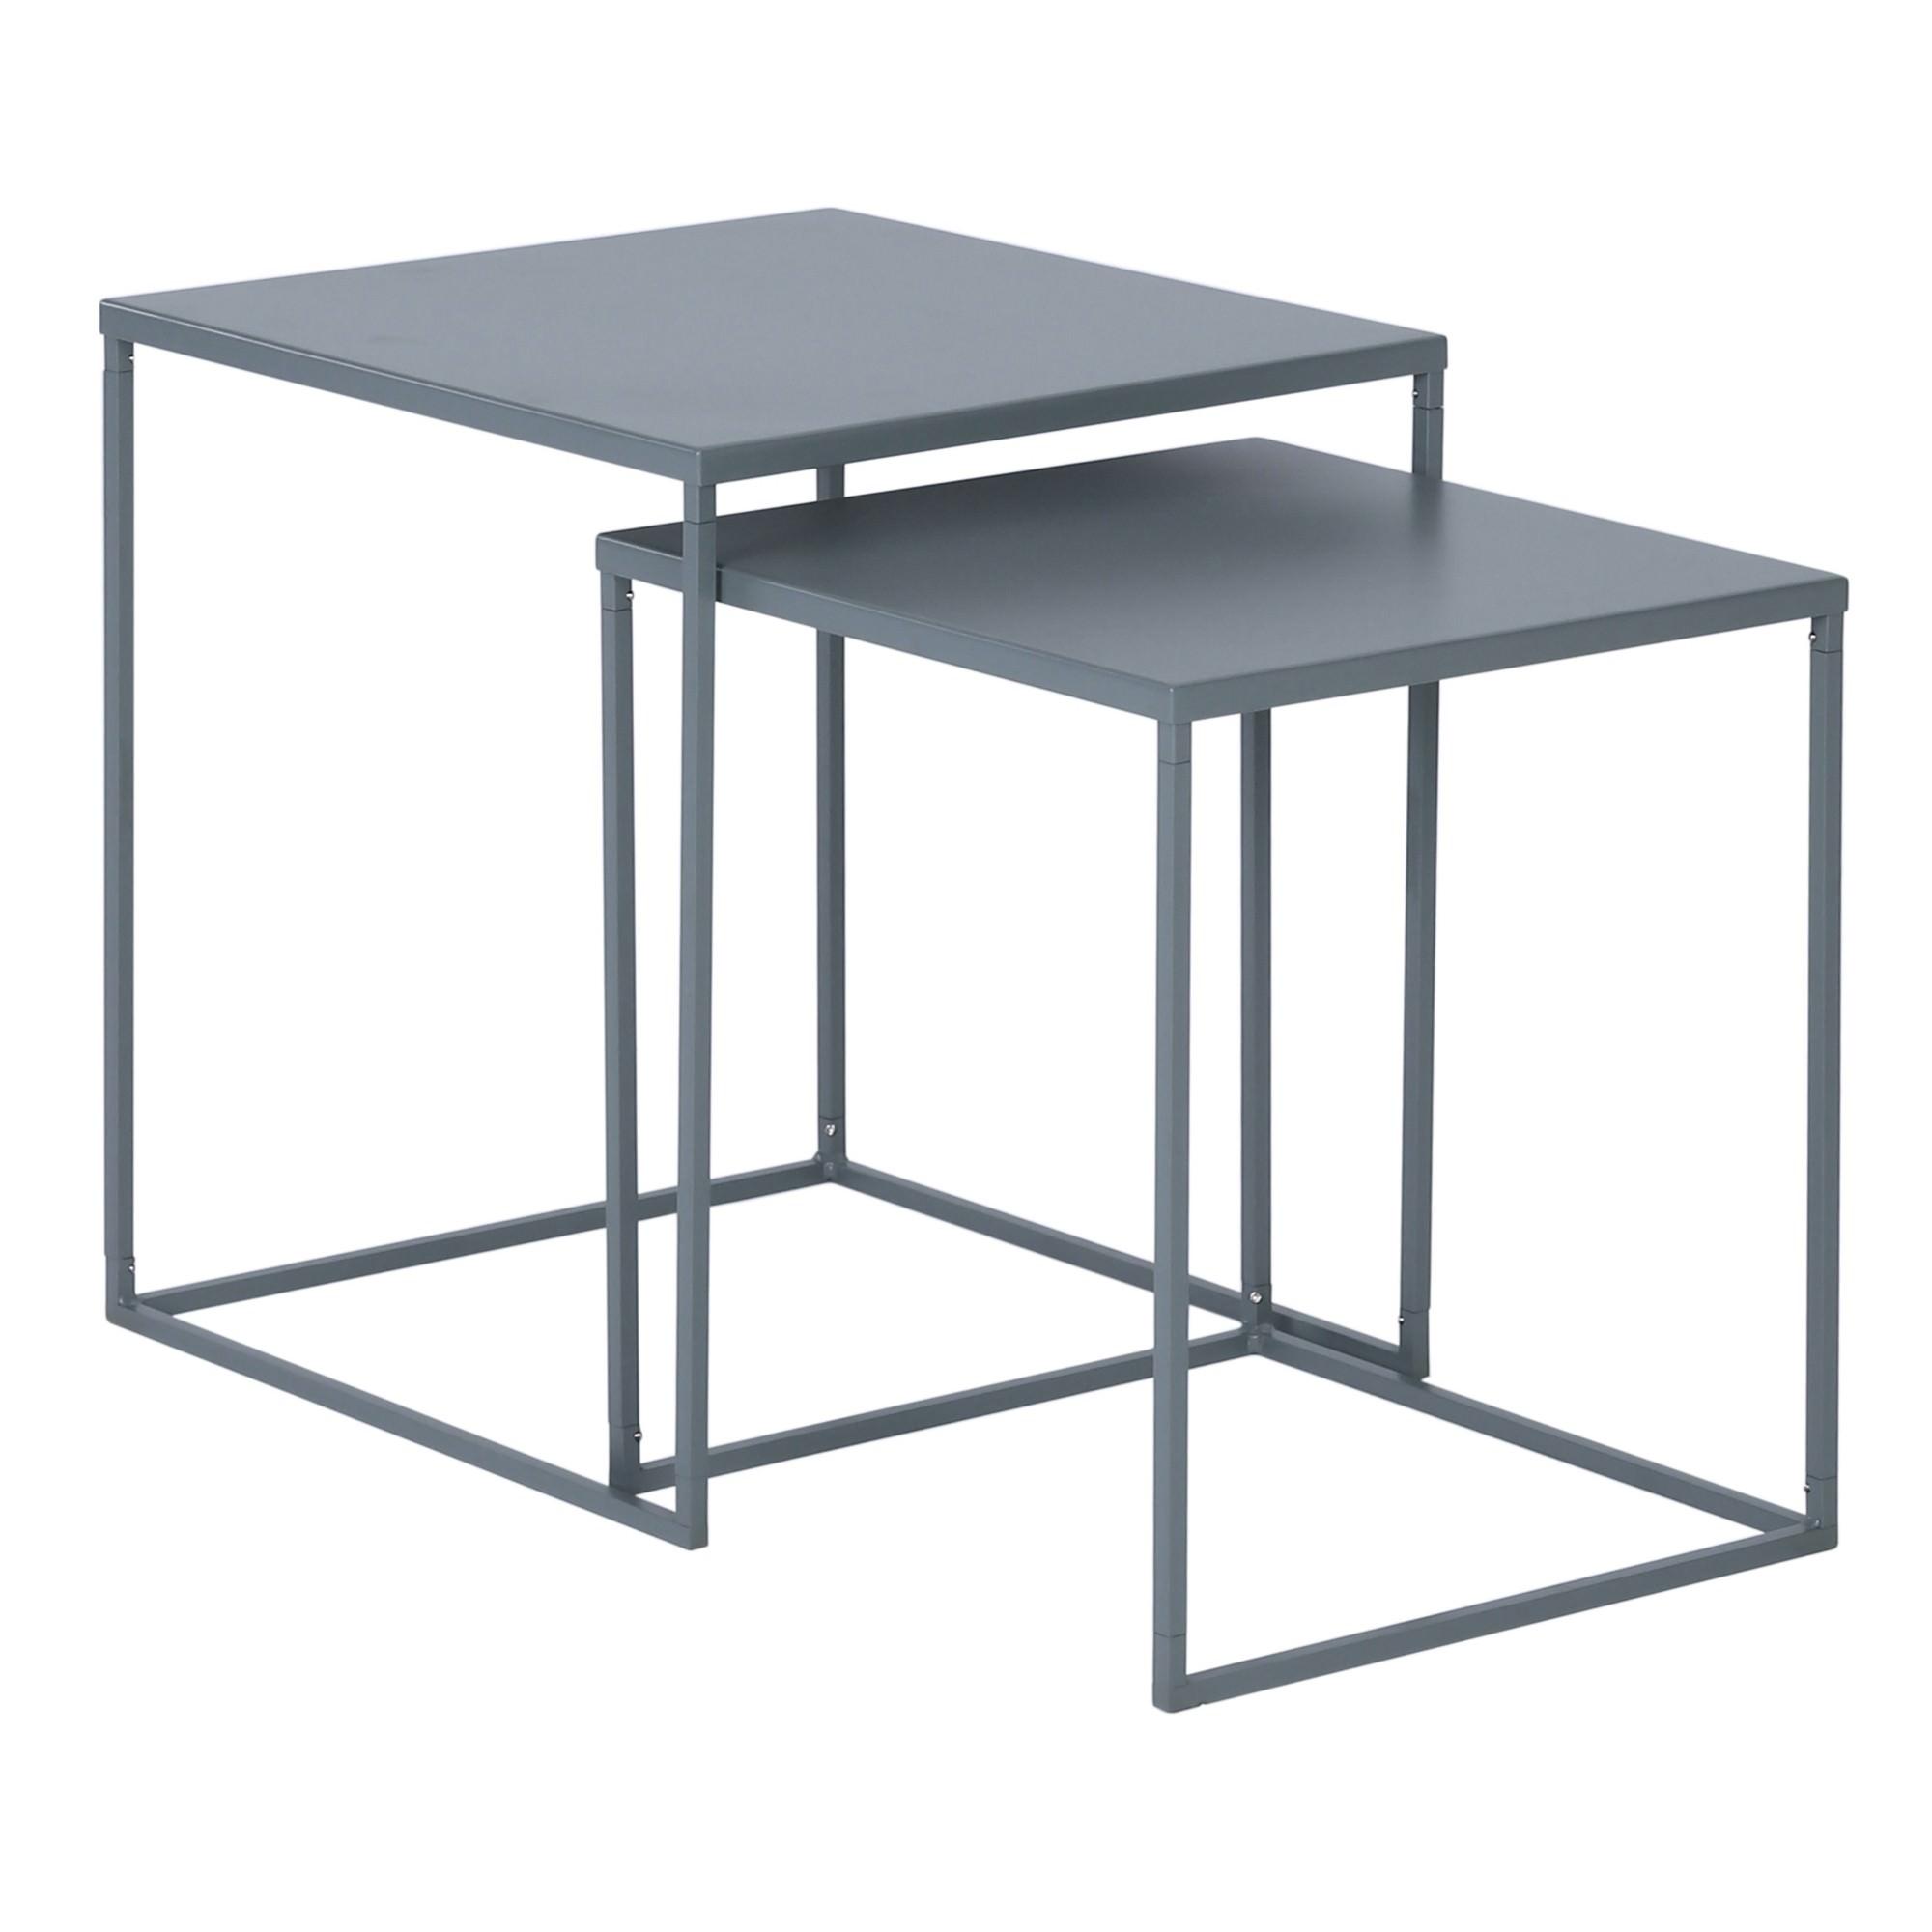 Darnell 2 Piece Metal Nesting Table Set, Grey